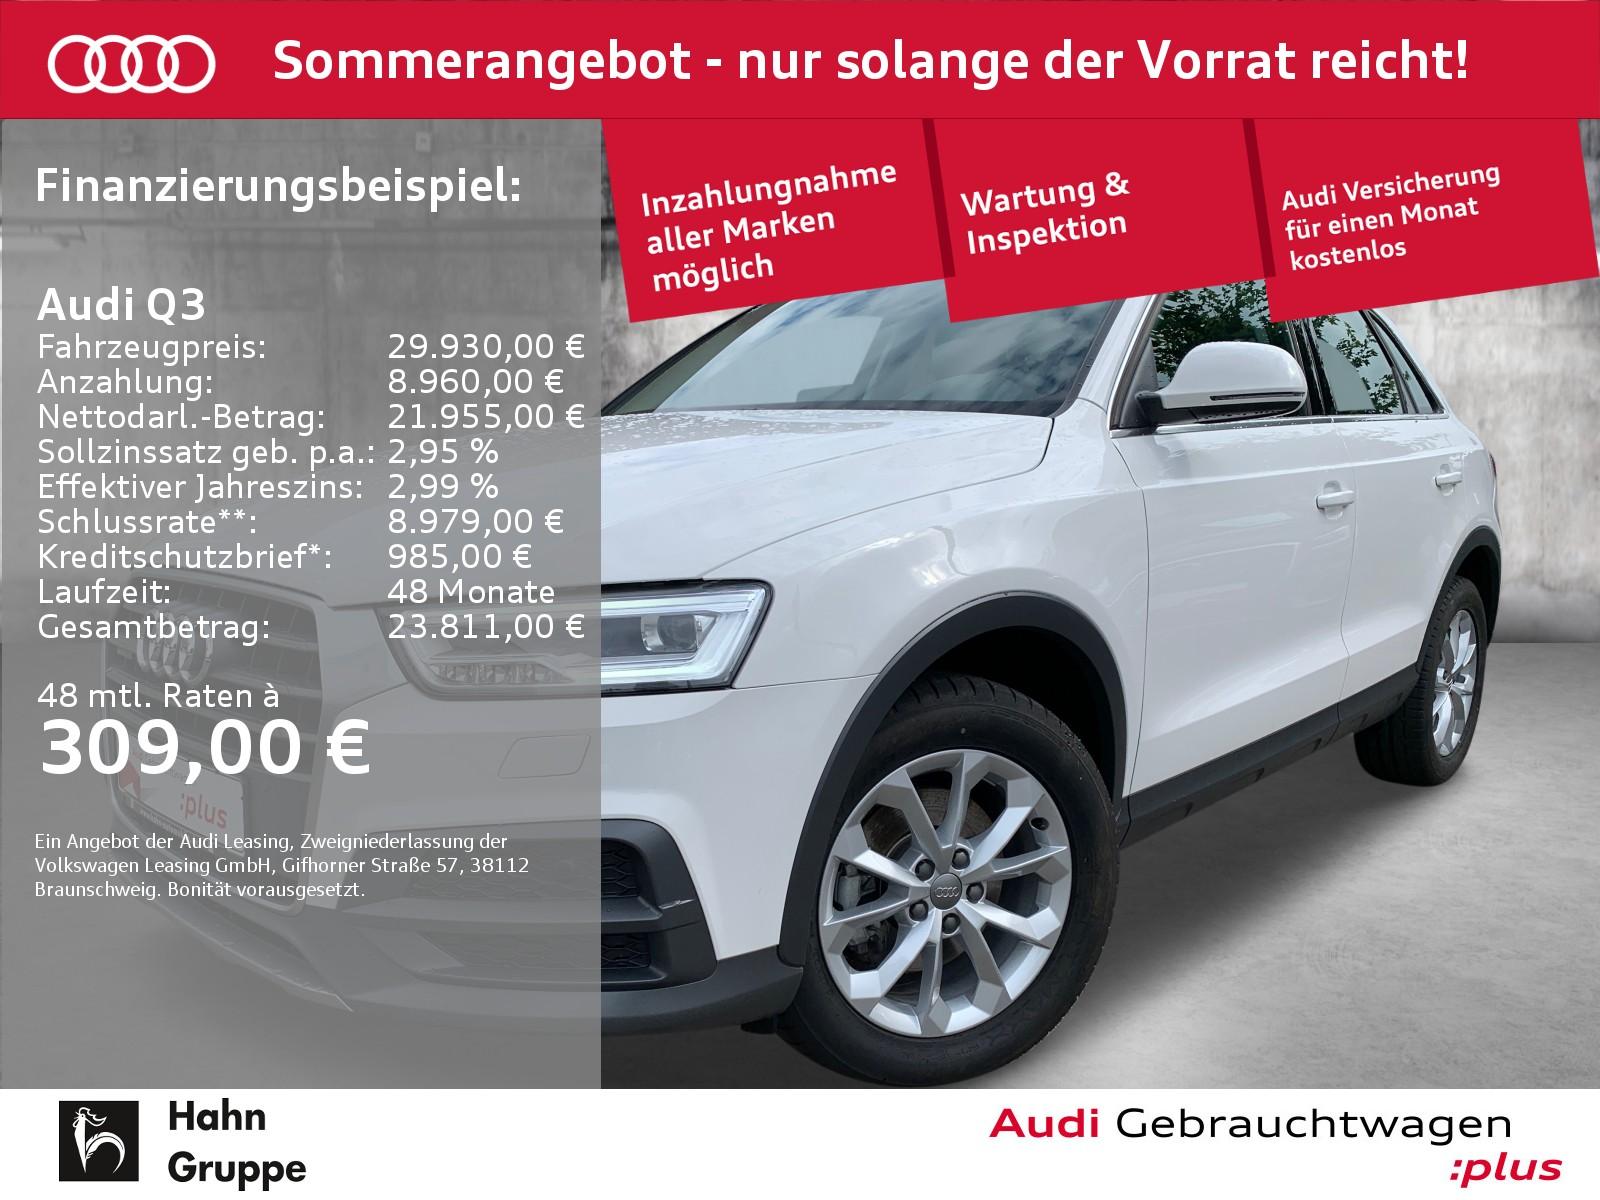 Audi Q3 2.0 TDI qua. S-trc Navi LED CAM Sitzh Klima, Jahr 2018, Diesel